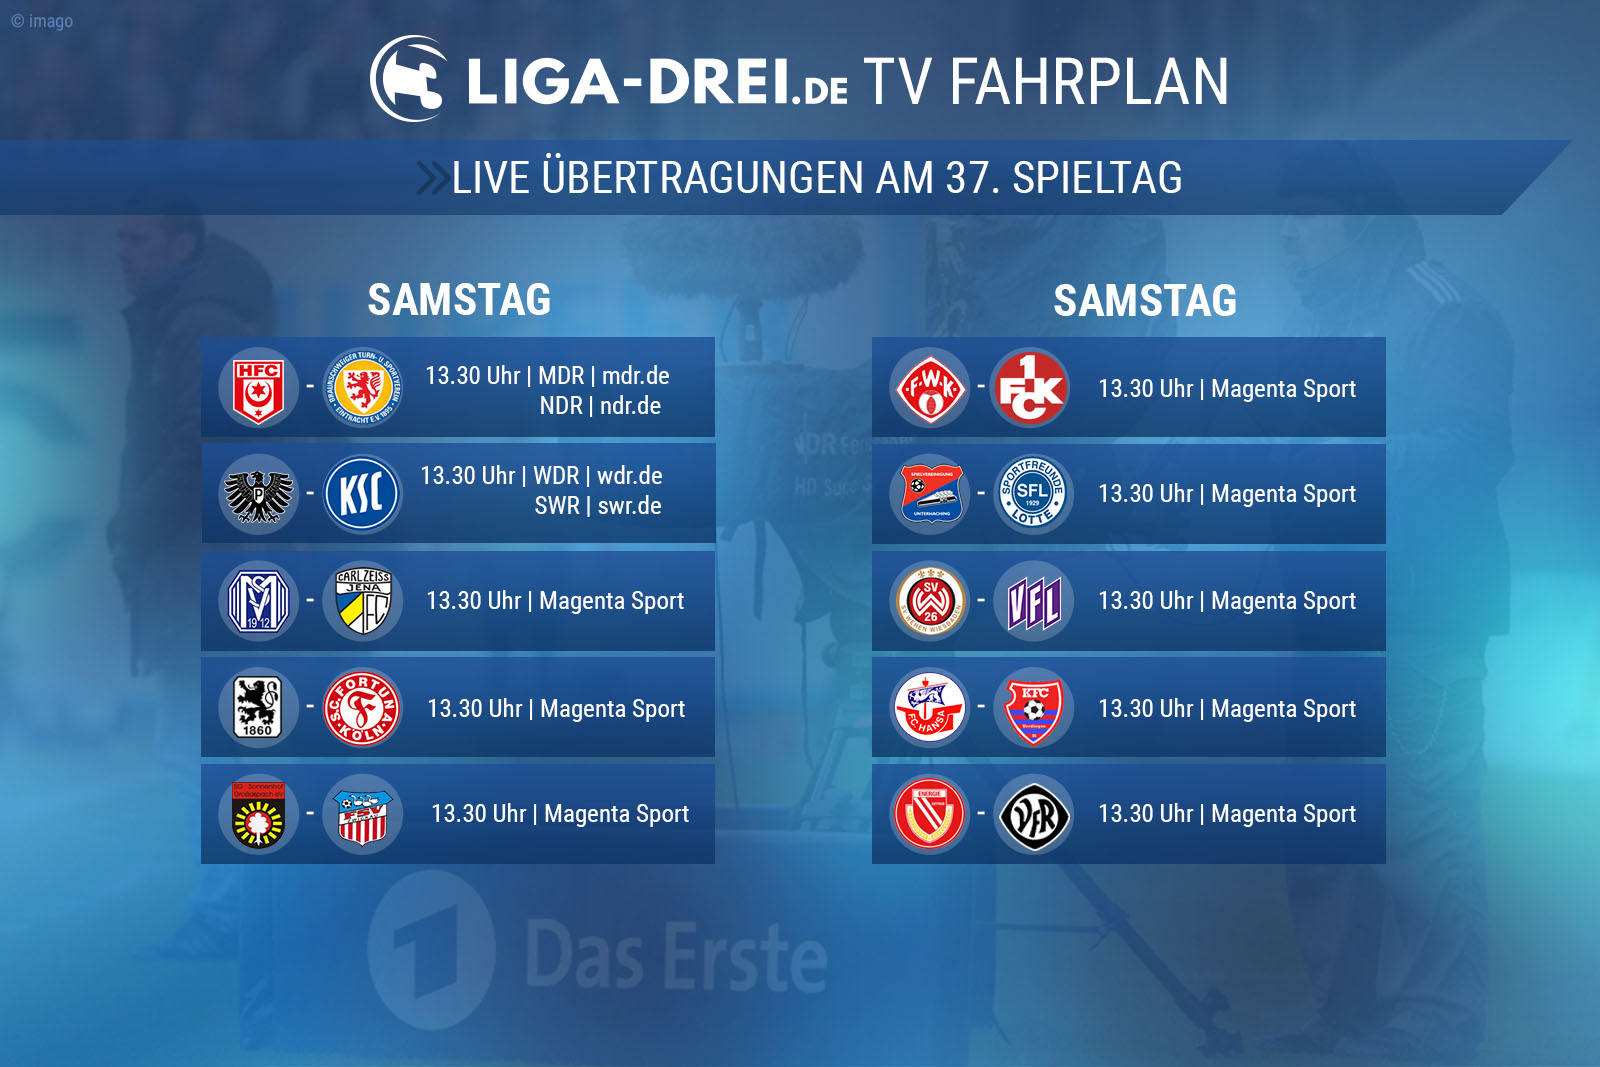 3. liga, tv fahrpan, free tv